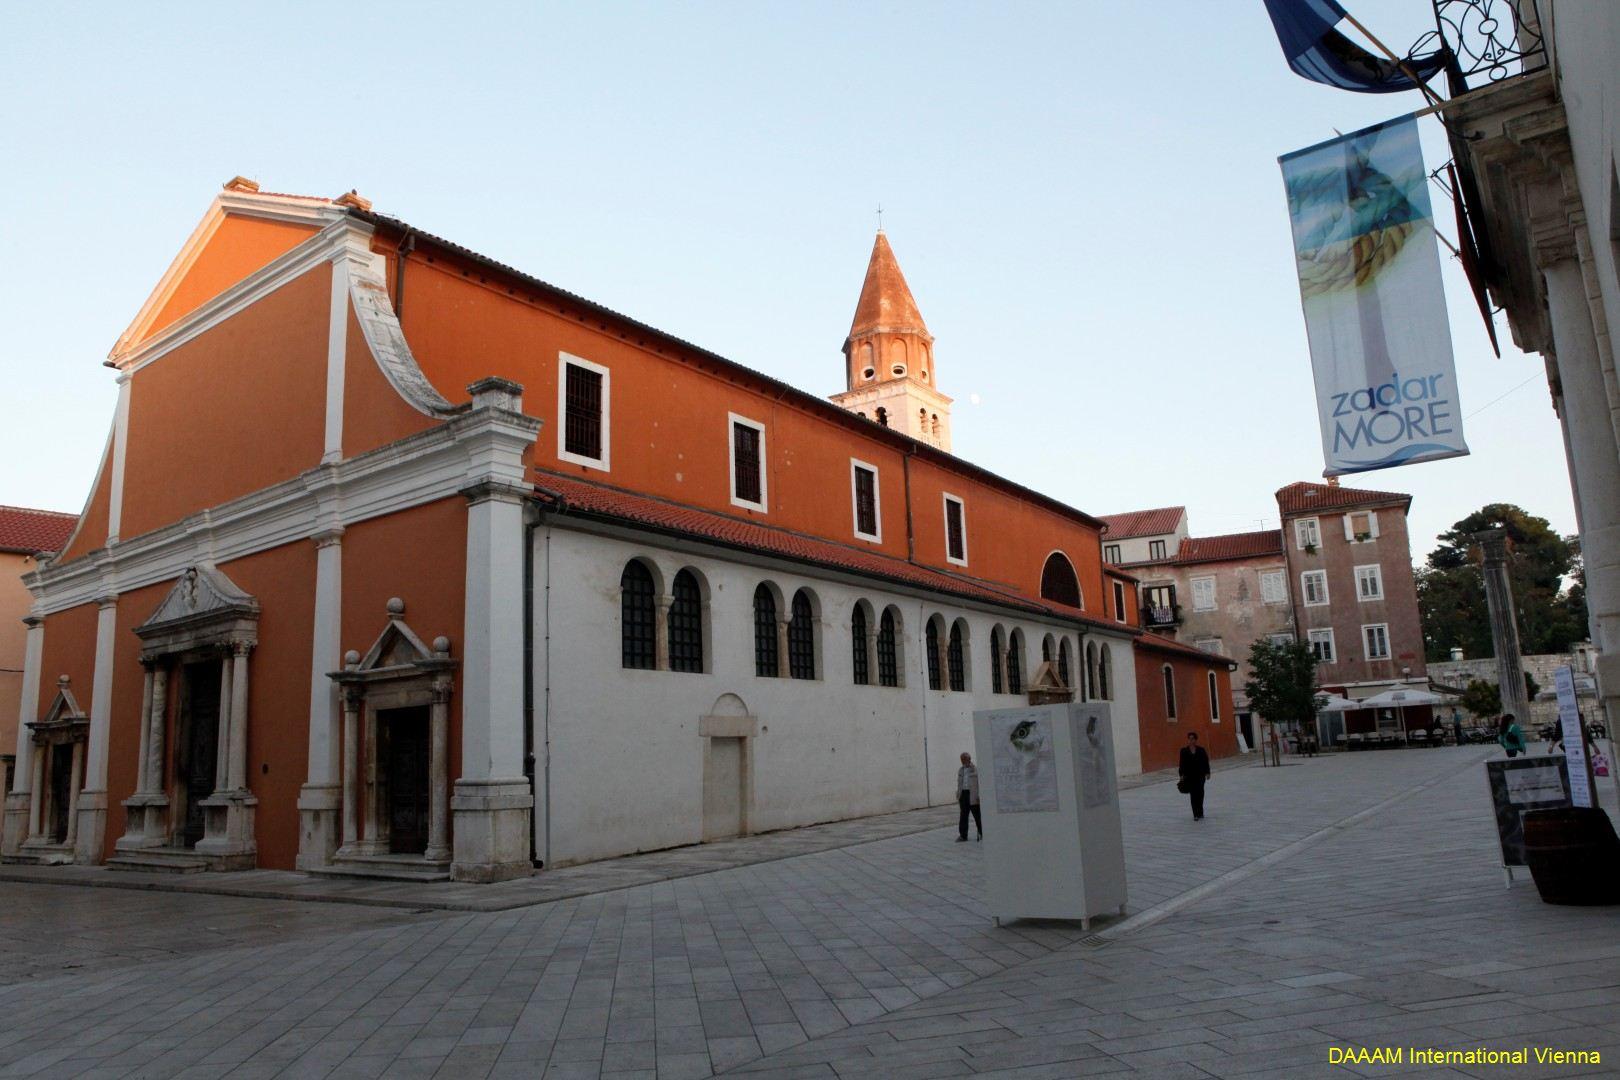 DAAAM_2012_Zadar_00_Zadar_City_008